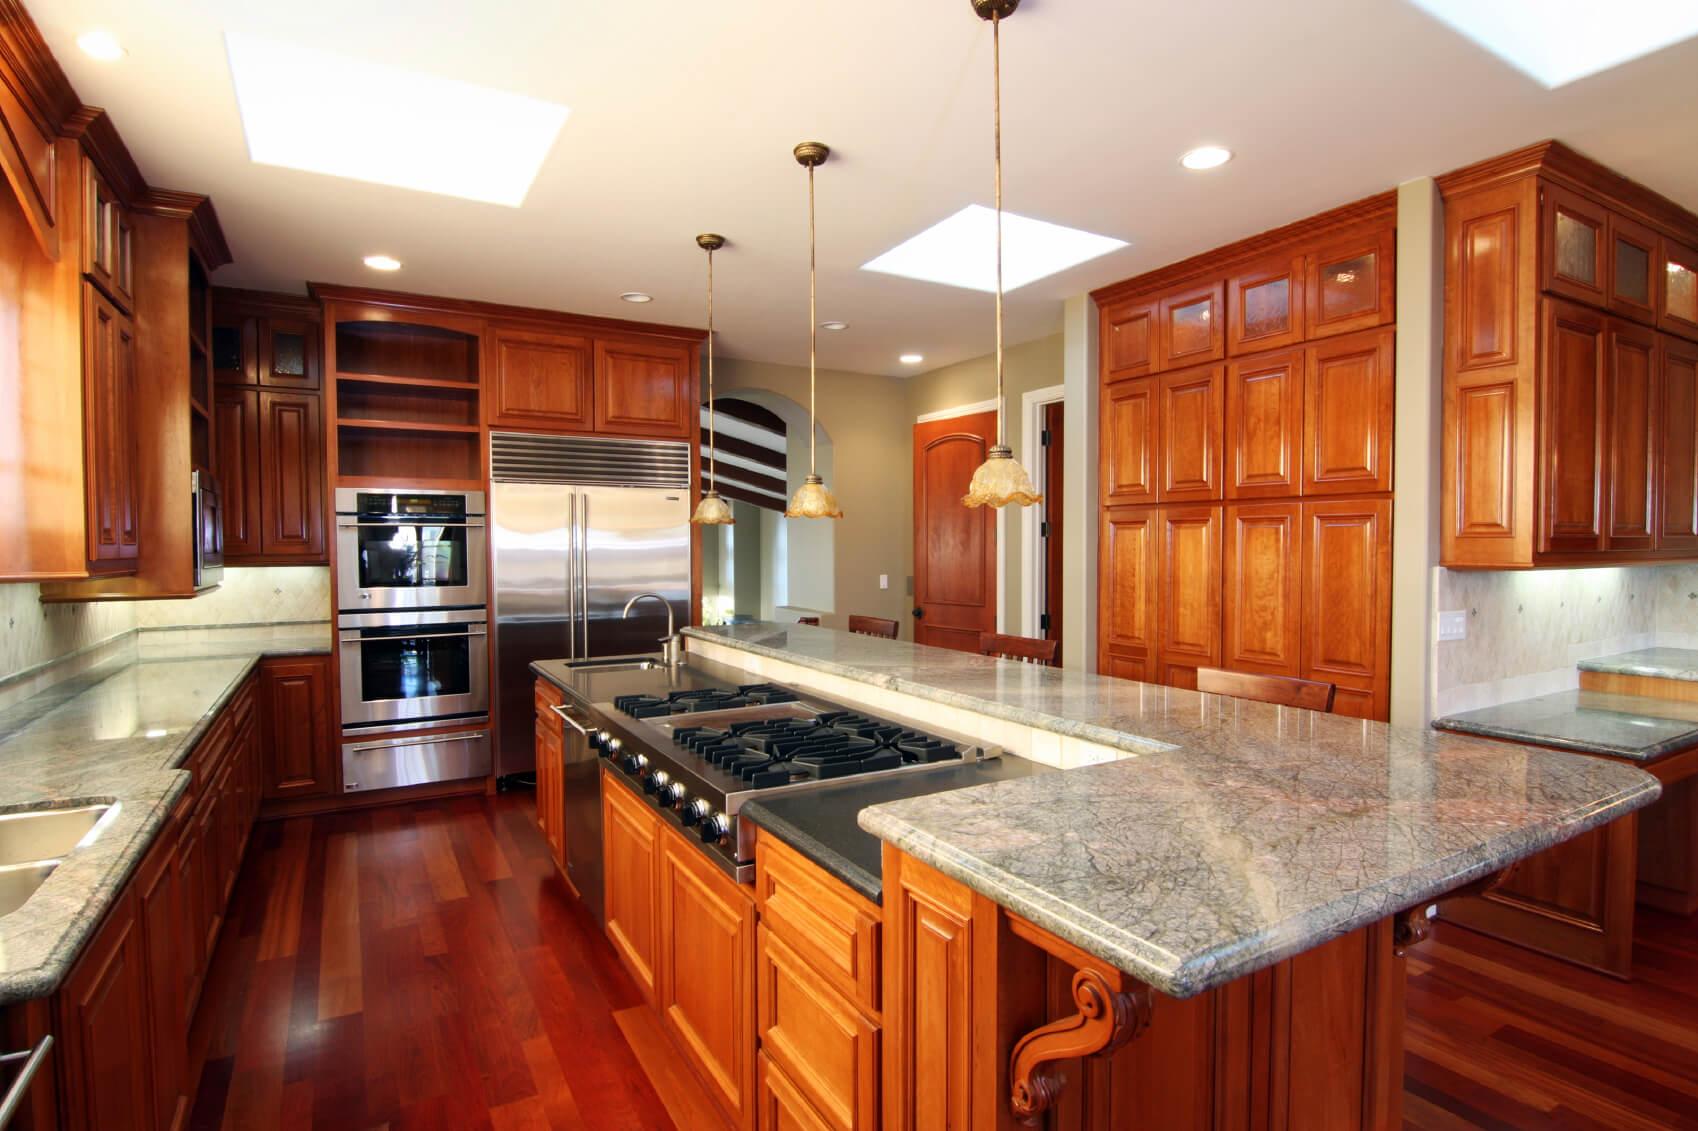 84 Custom Luxury Kitchen Island Ideas & Designs